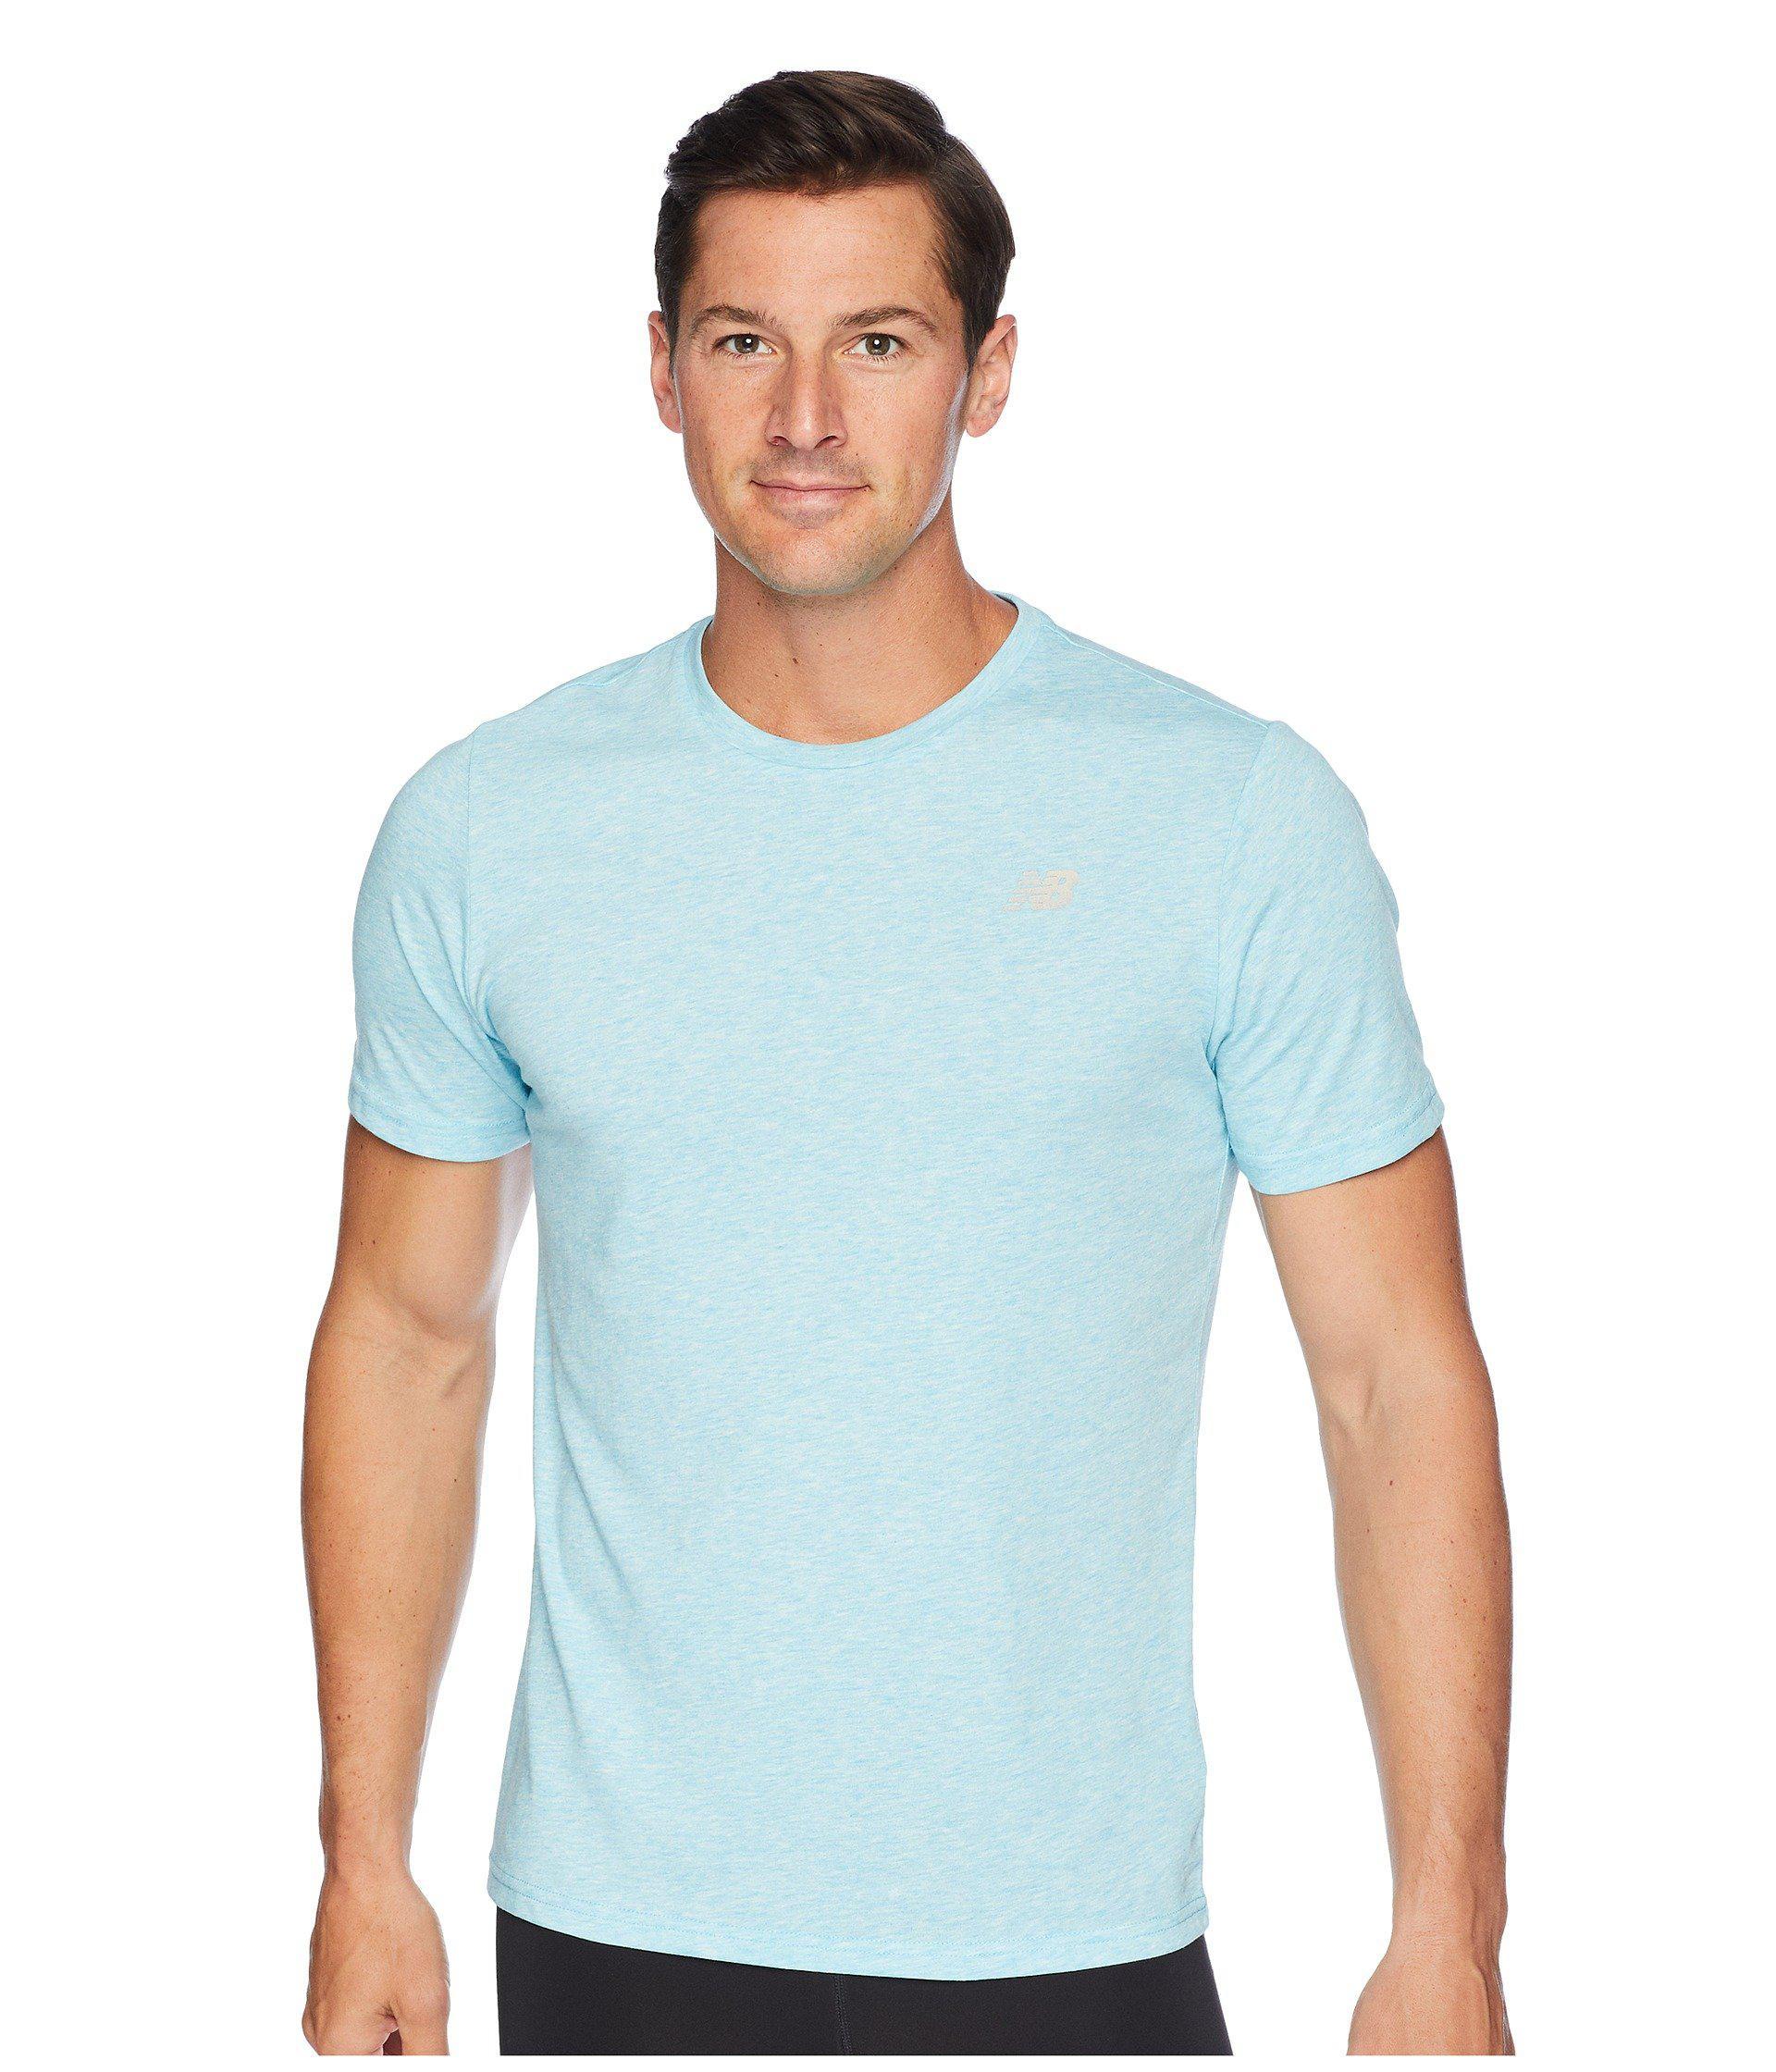 06f76dc7d New Balance Heather Tech Short Sleeve (black Heather) Men's T Shirt ...